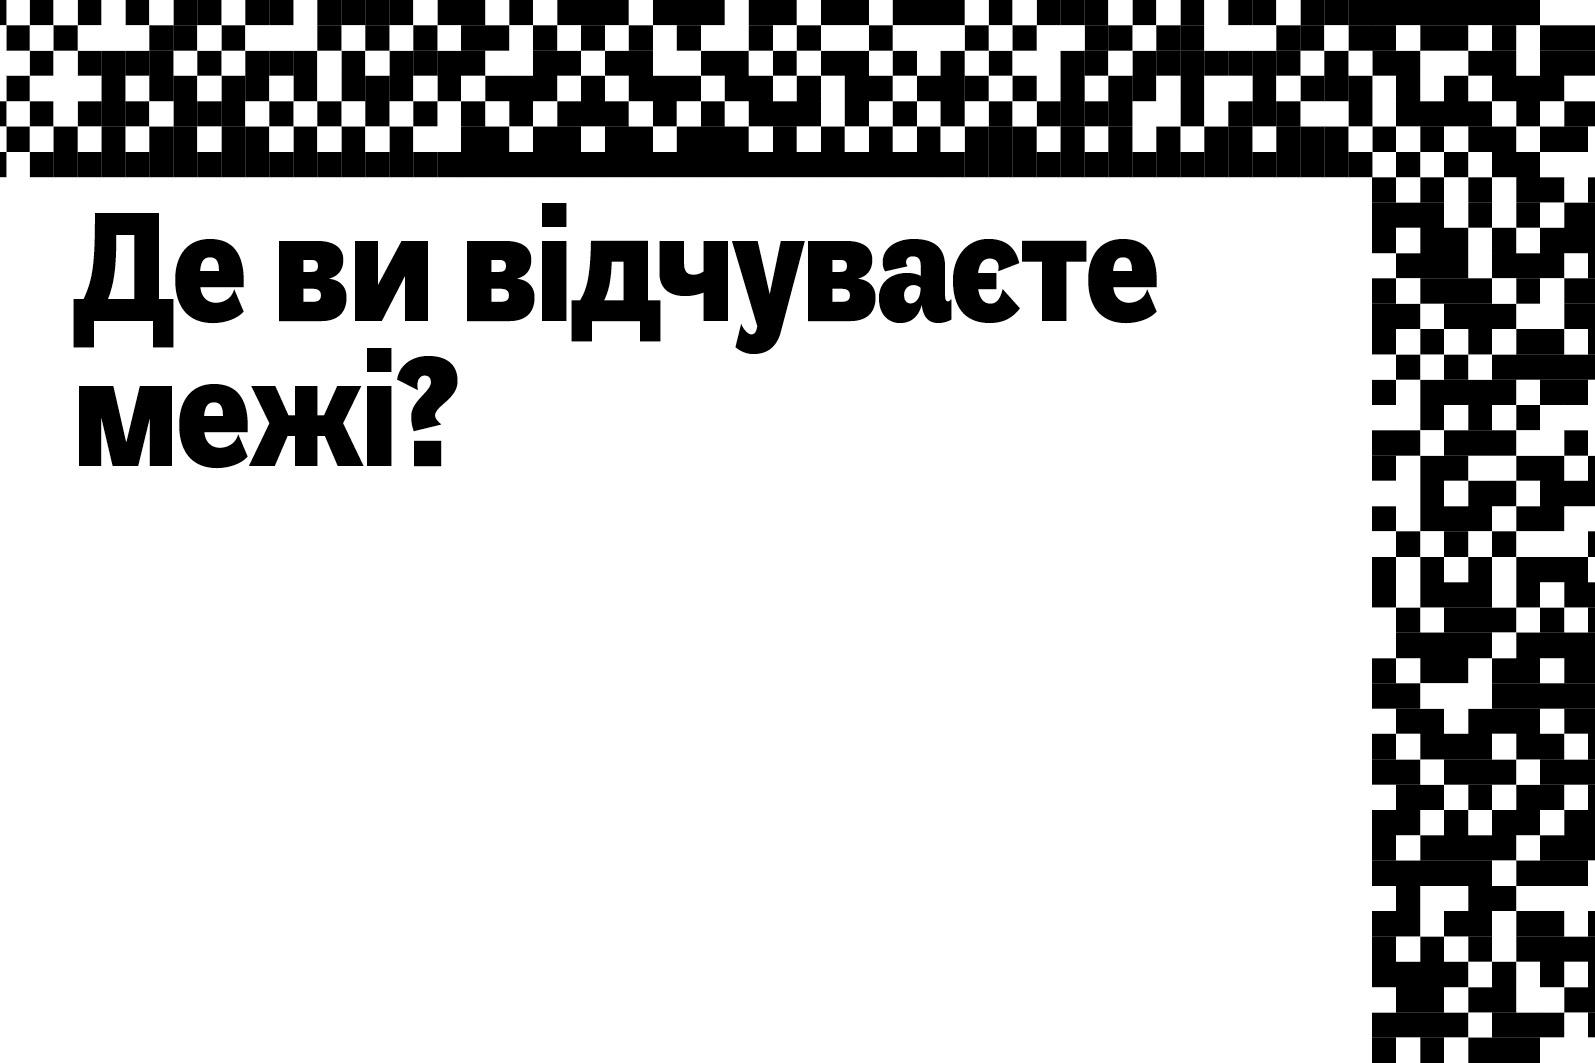 150408_Fragenkatalog_C_seite 10147